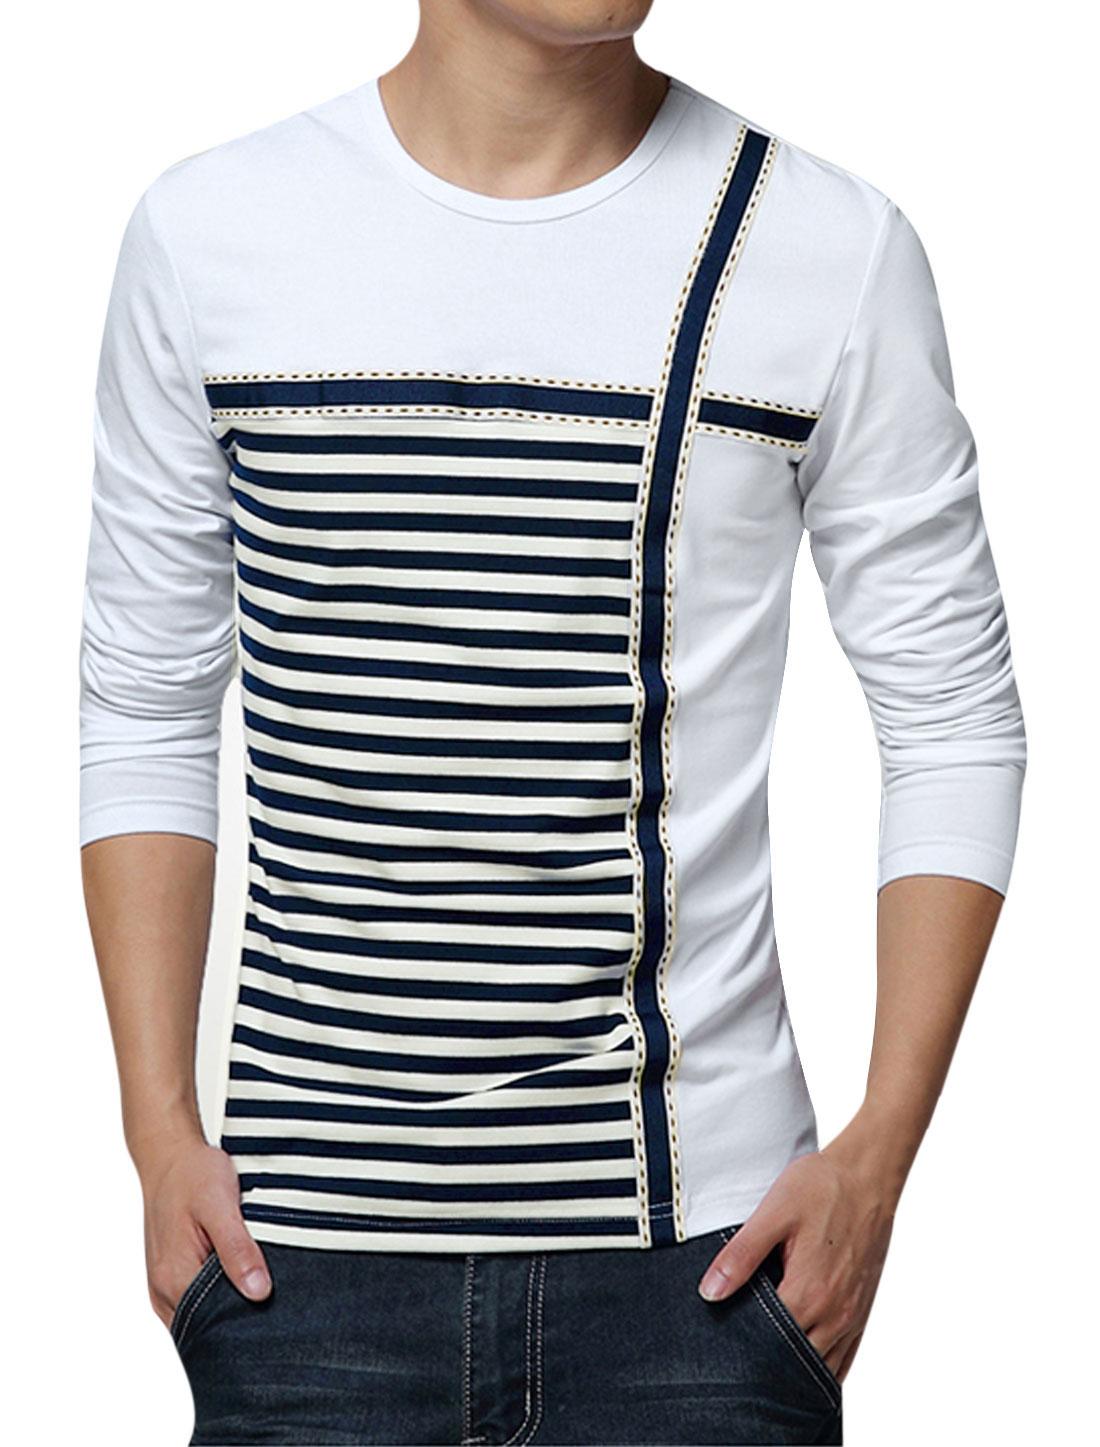 Man Stripes Round Neck Long Sleeves Slipover Casual Panel T-shirt White M